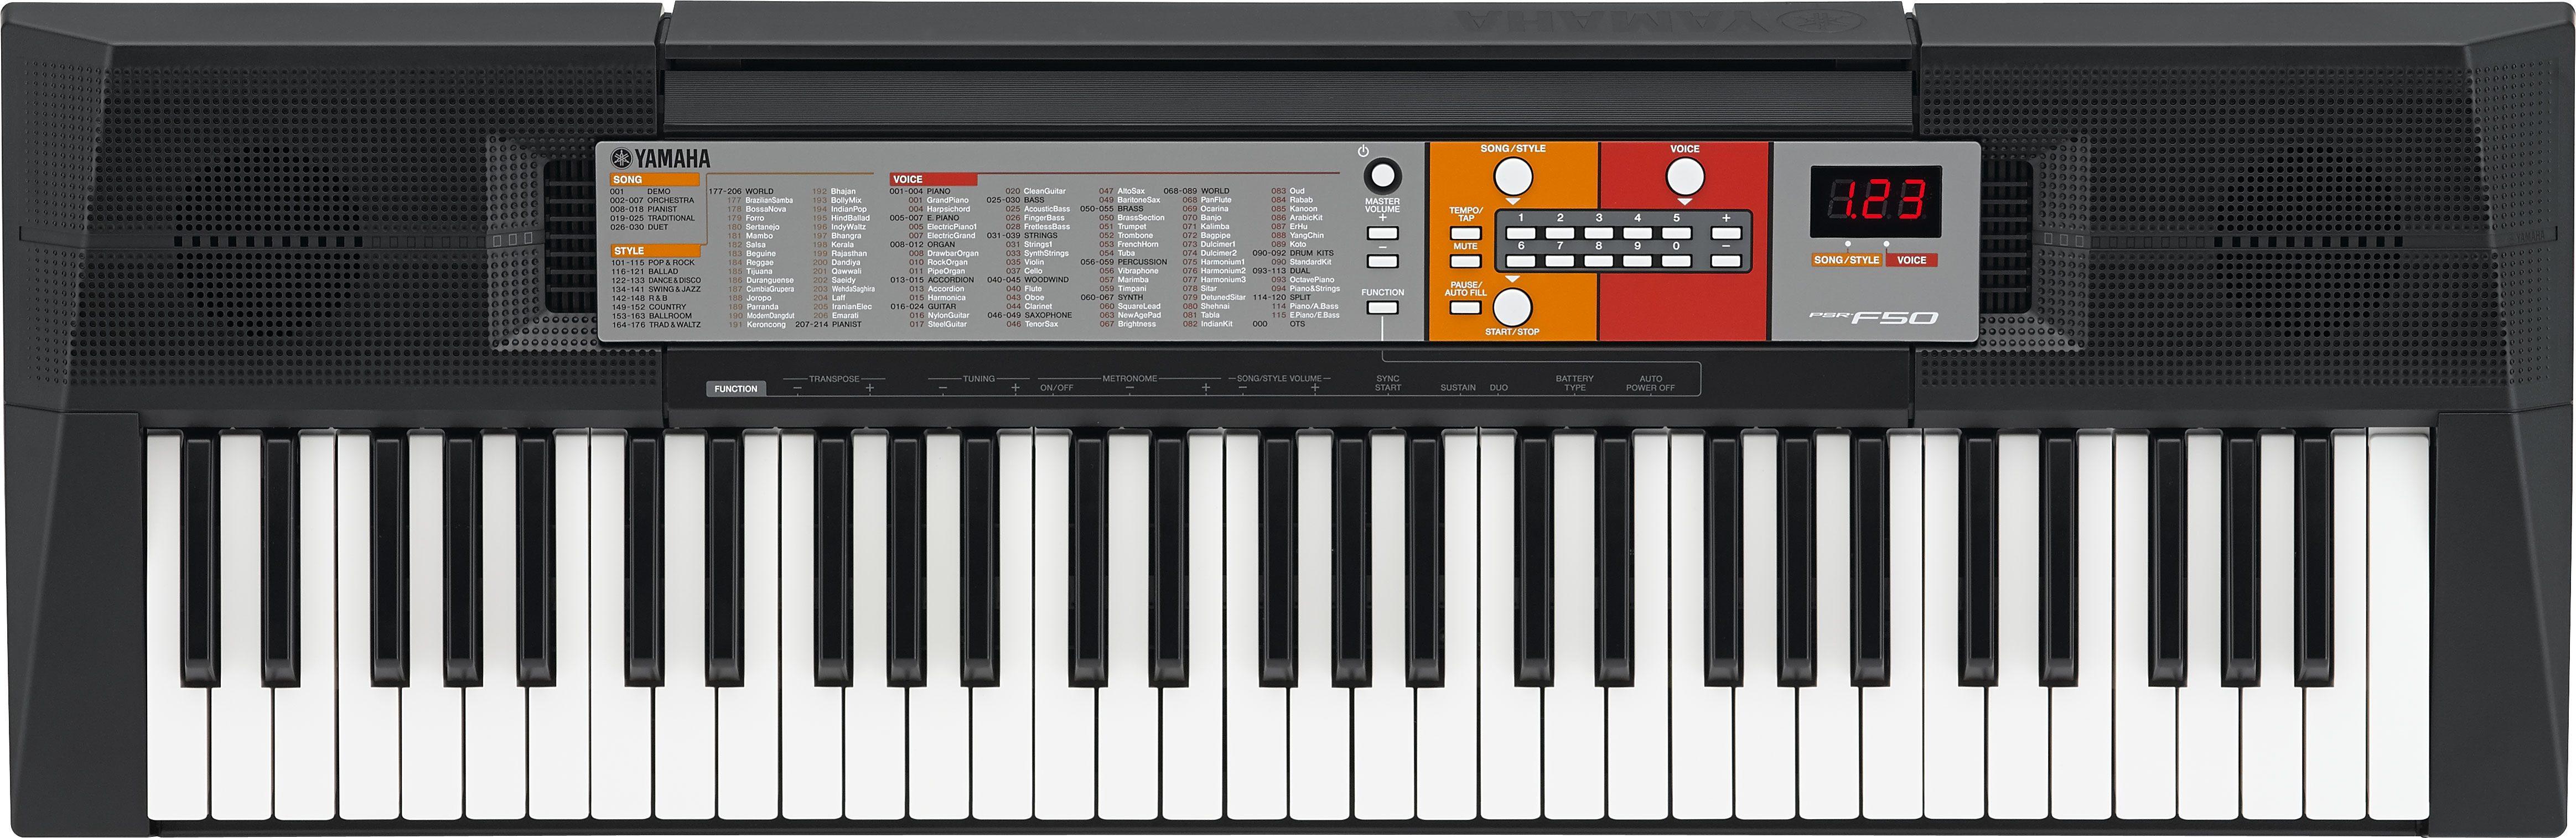 Keyboard, Yamaha, »Digitales Keyboard PSR-F50«